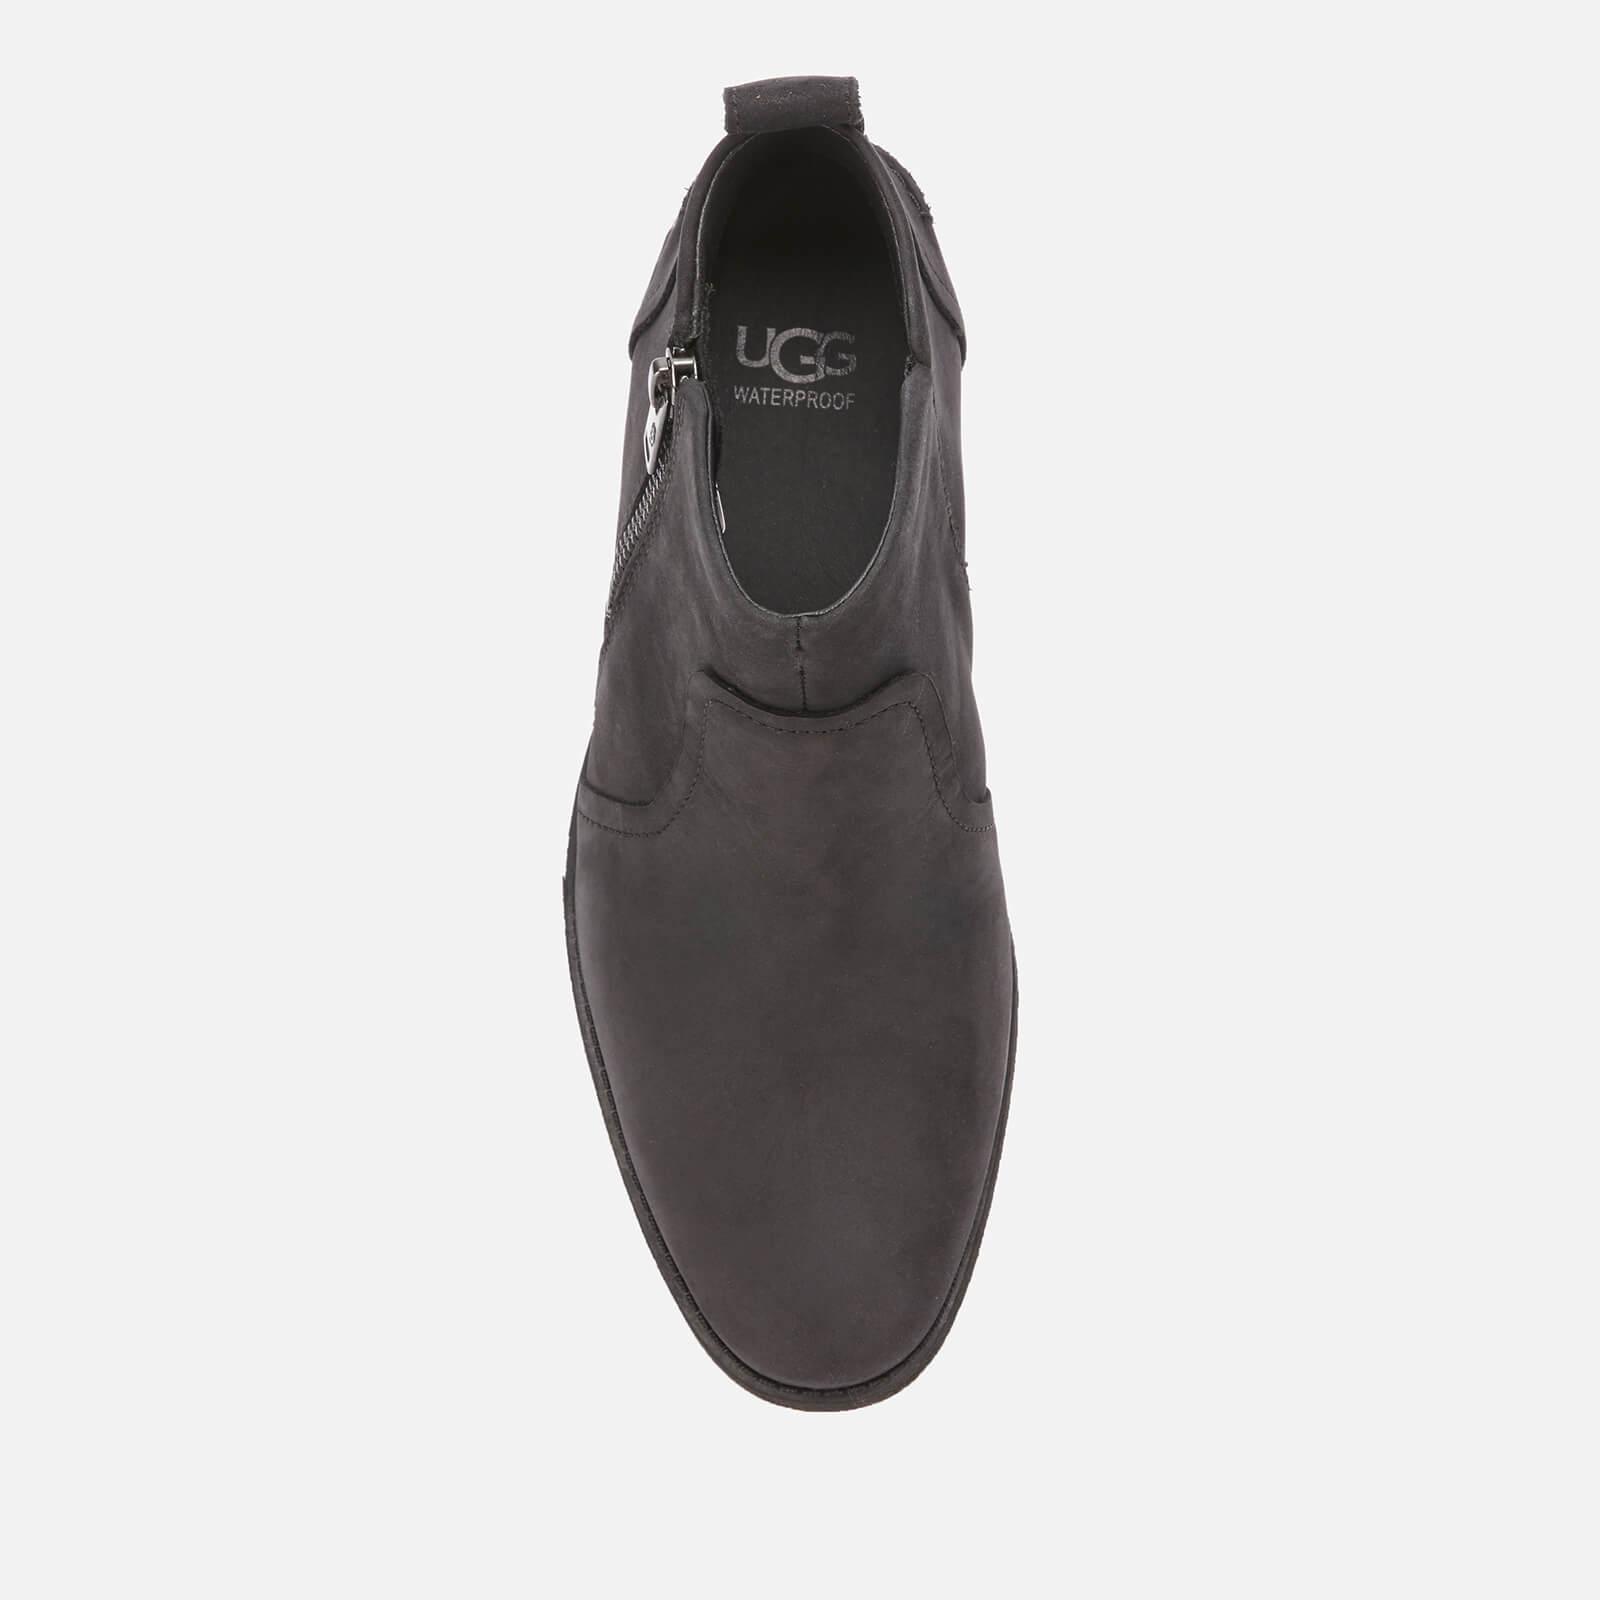 Ugg Women's Aureo Ii Waterproof Ankle Boots - Black - Uk 3